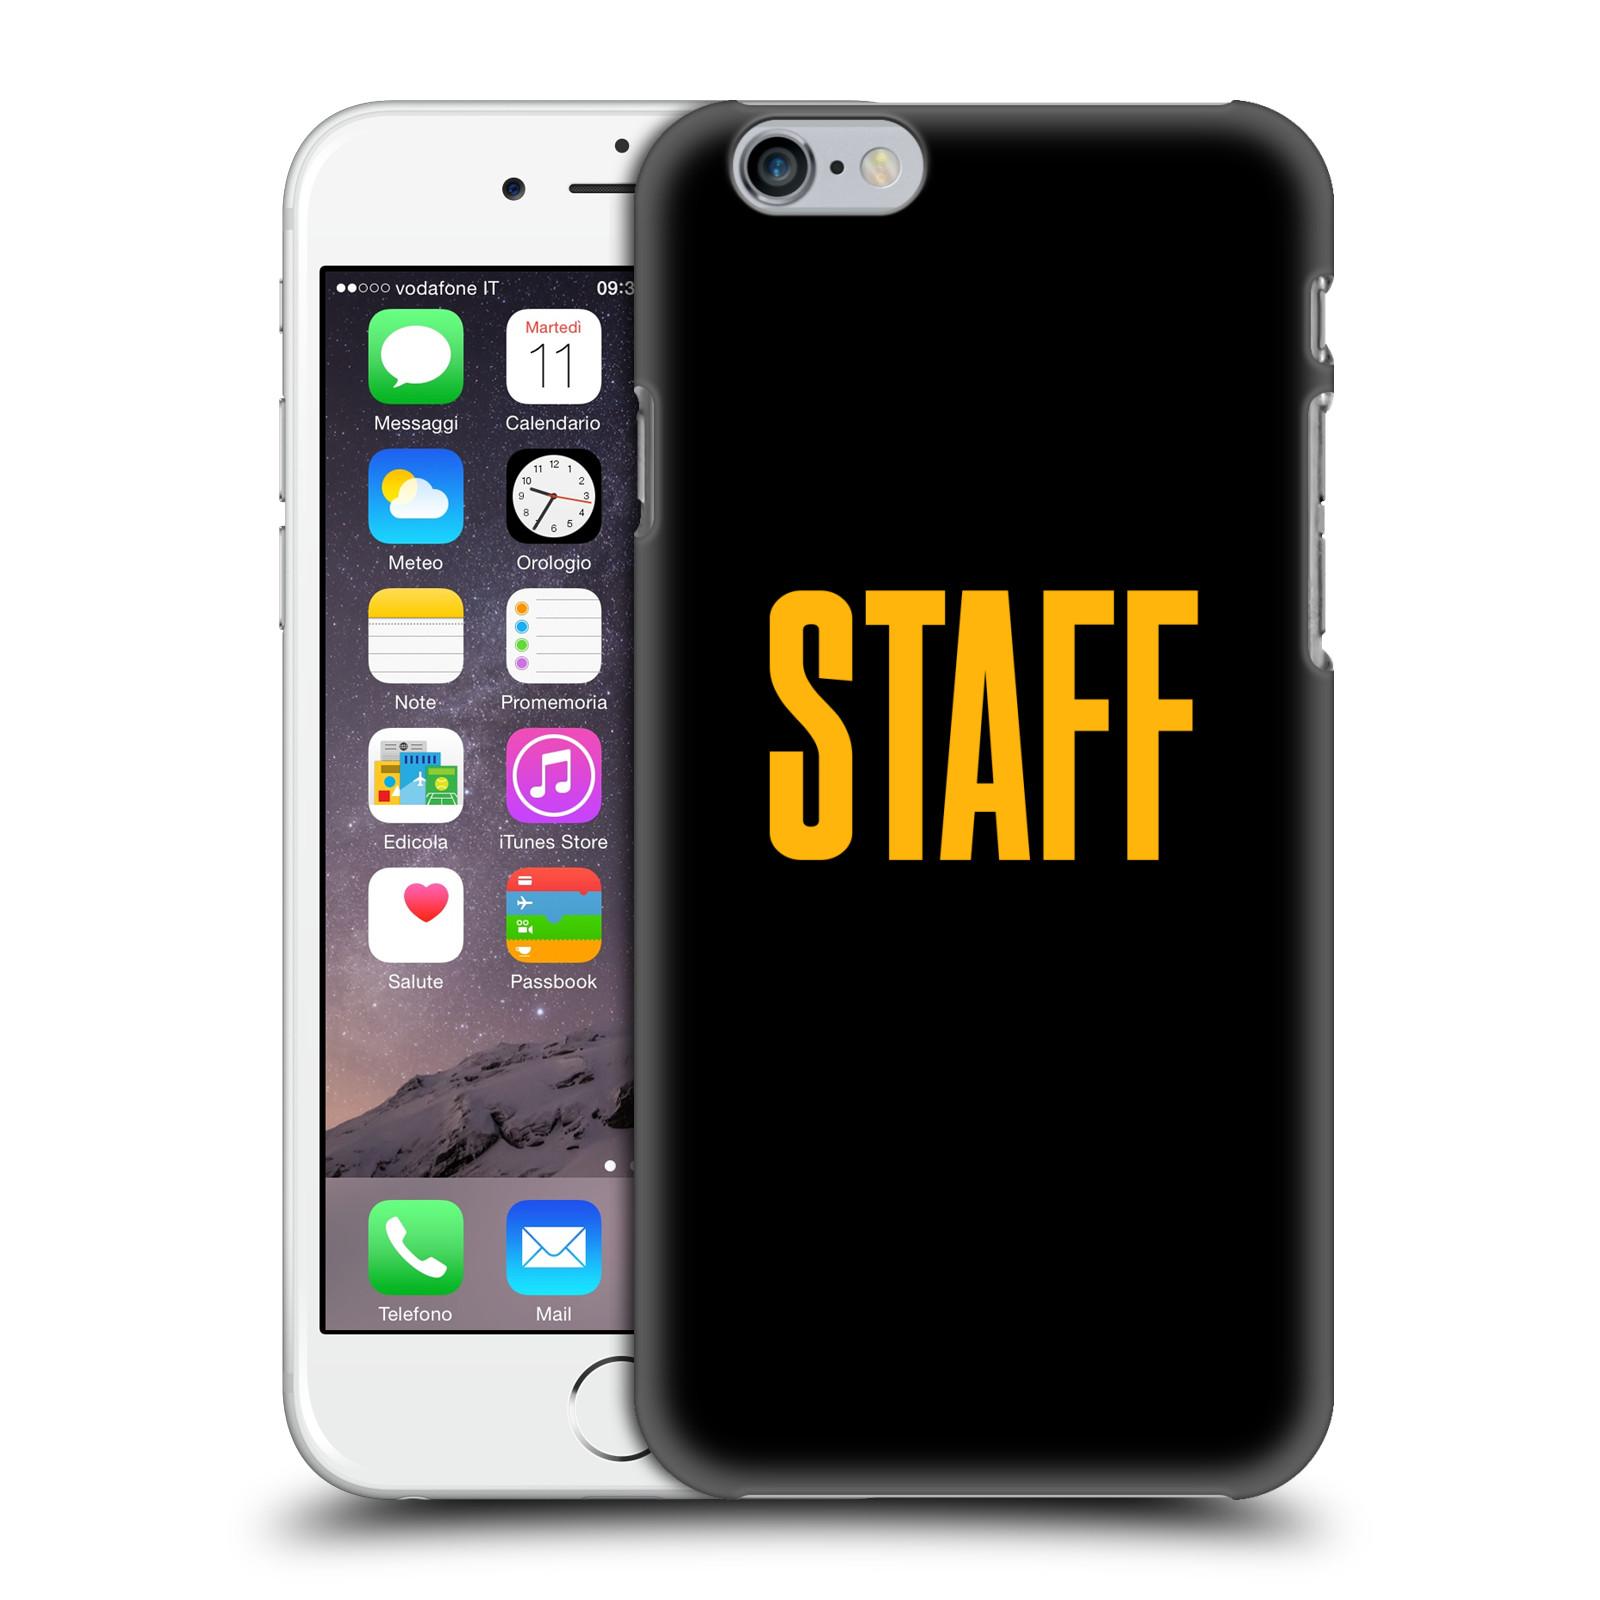 OFFICIAL-JUSTIN-BIEBER-TOUR-MERCHANDISE-HARD-BACK-CASE-FOR-APPLE-iPHONE-PHONES